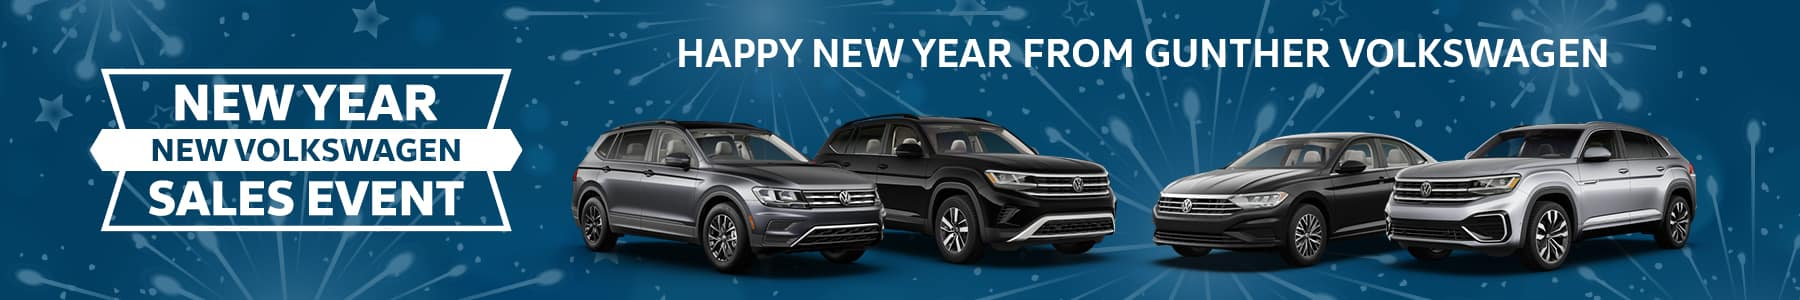 New year, new Volkswagen sales event. Happy New Year from Gunther Volkswagen.